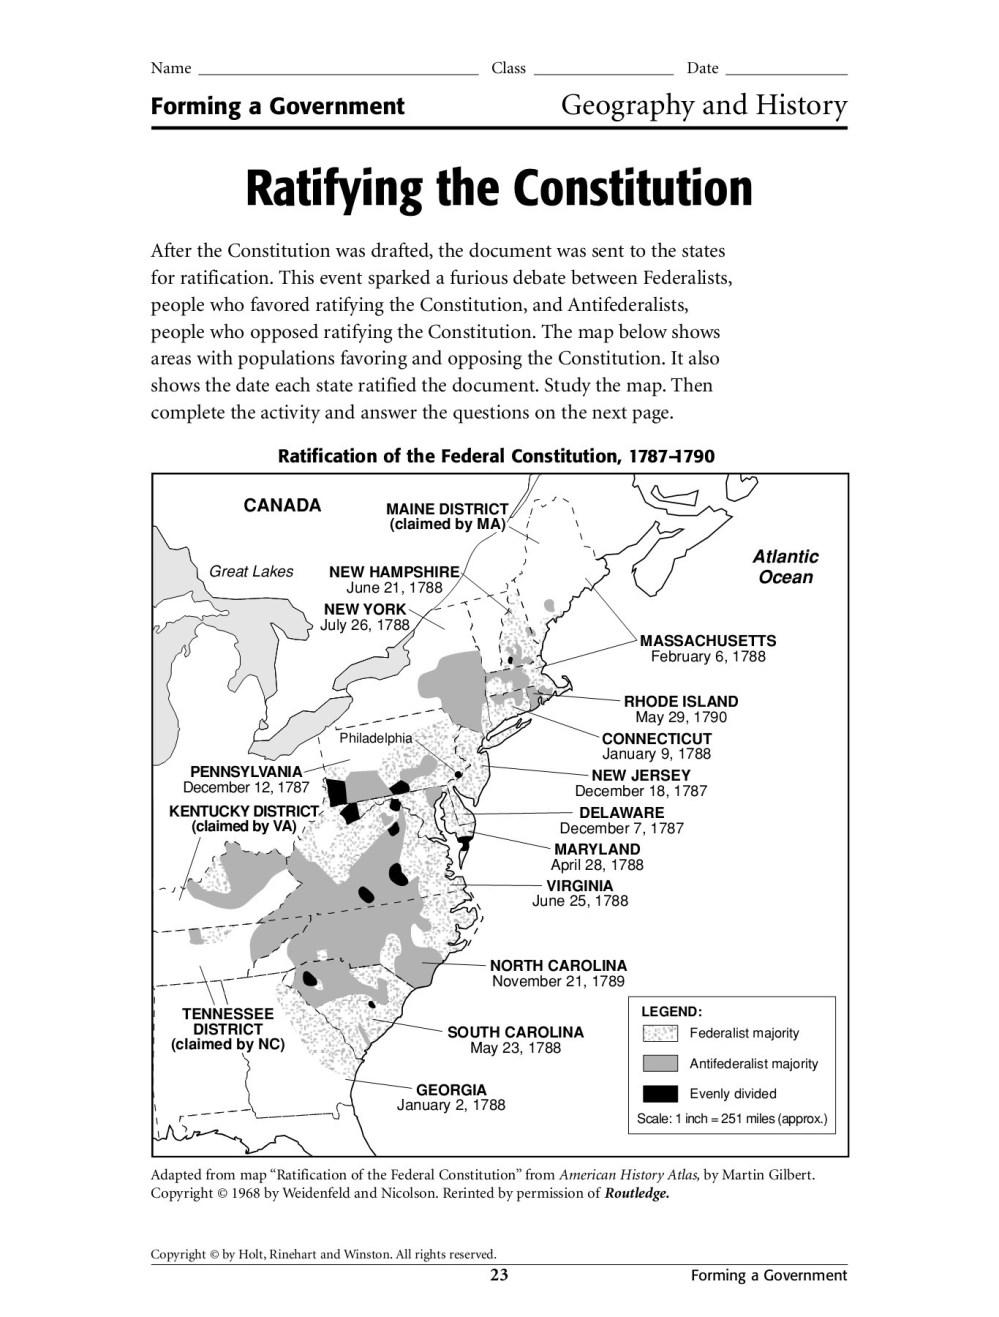 medium resolution of 31 Ratifying The Constitution Worksheet - Worksheet Resource Plans